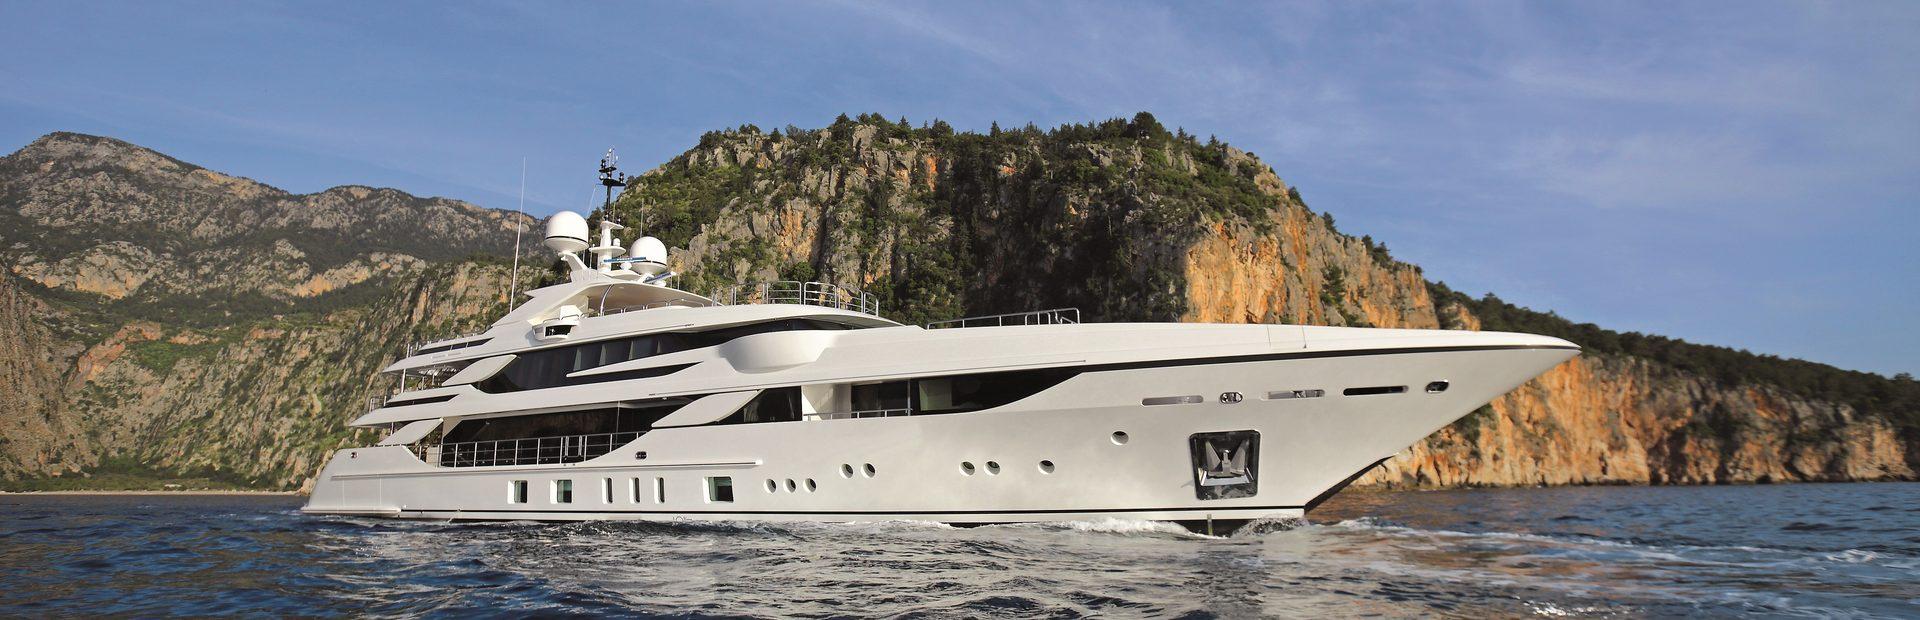 FB800 Series Yacht Charter